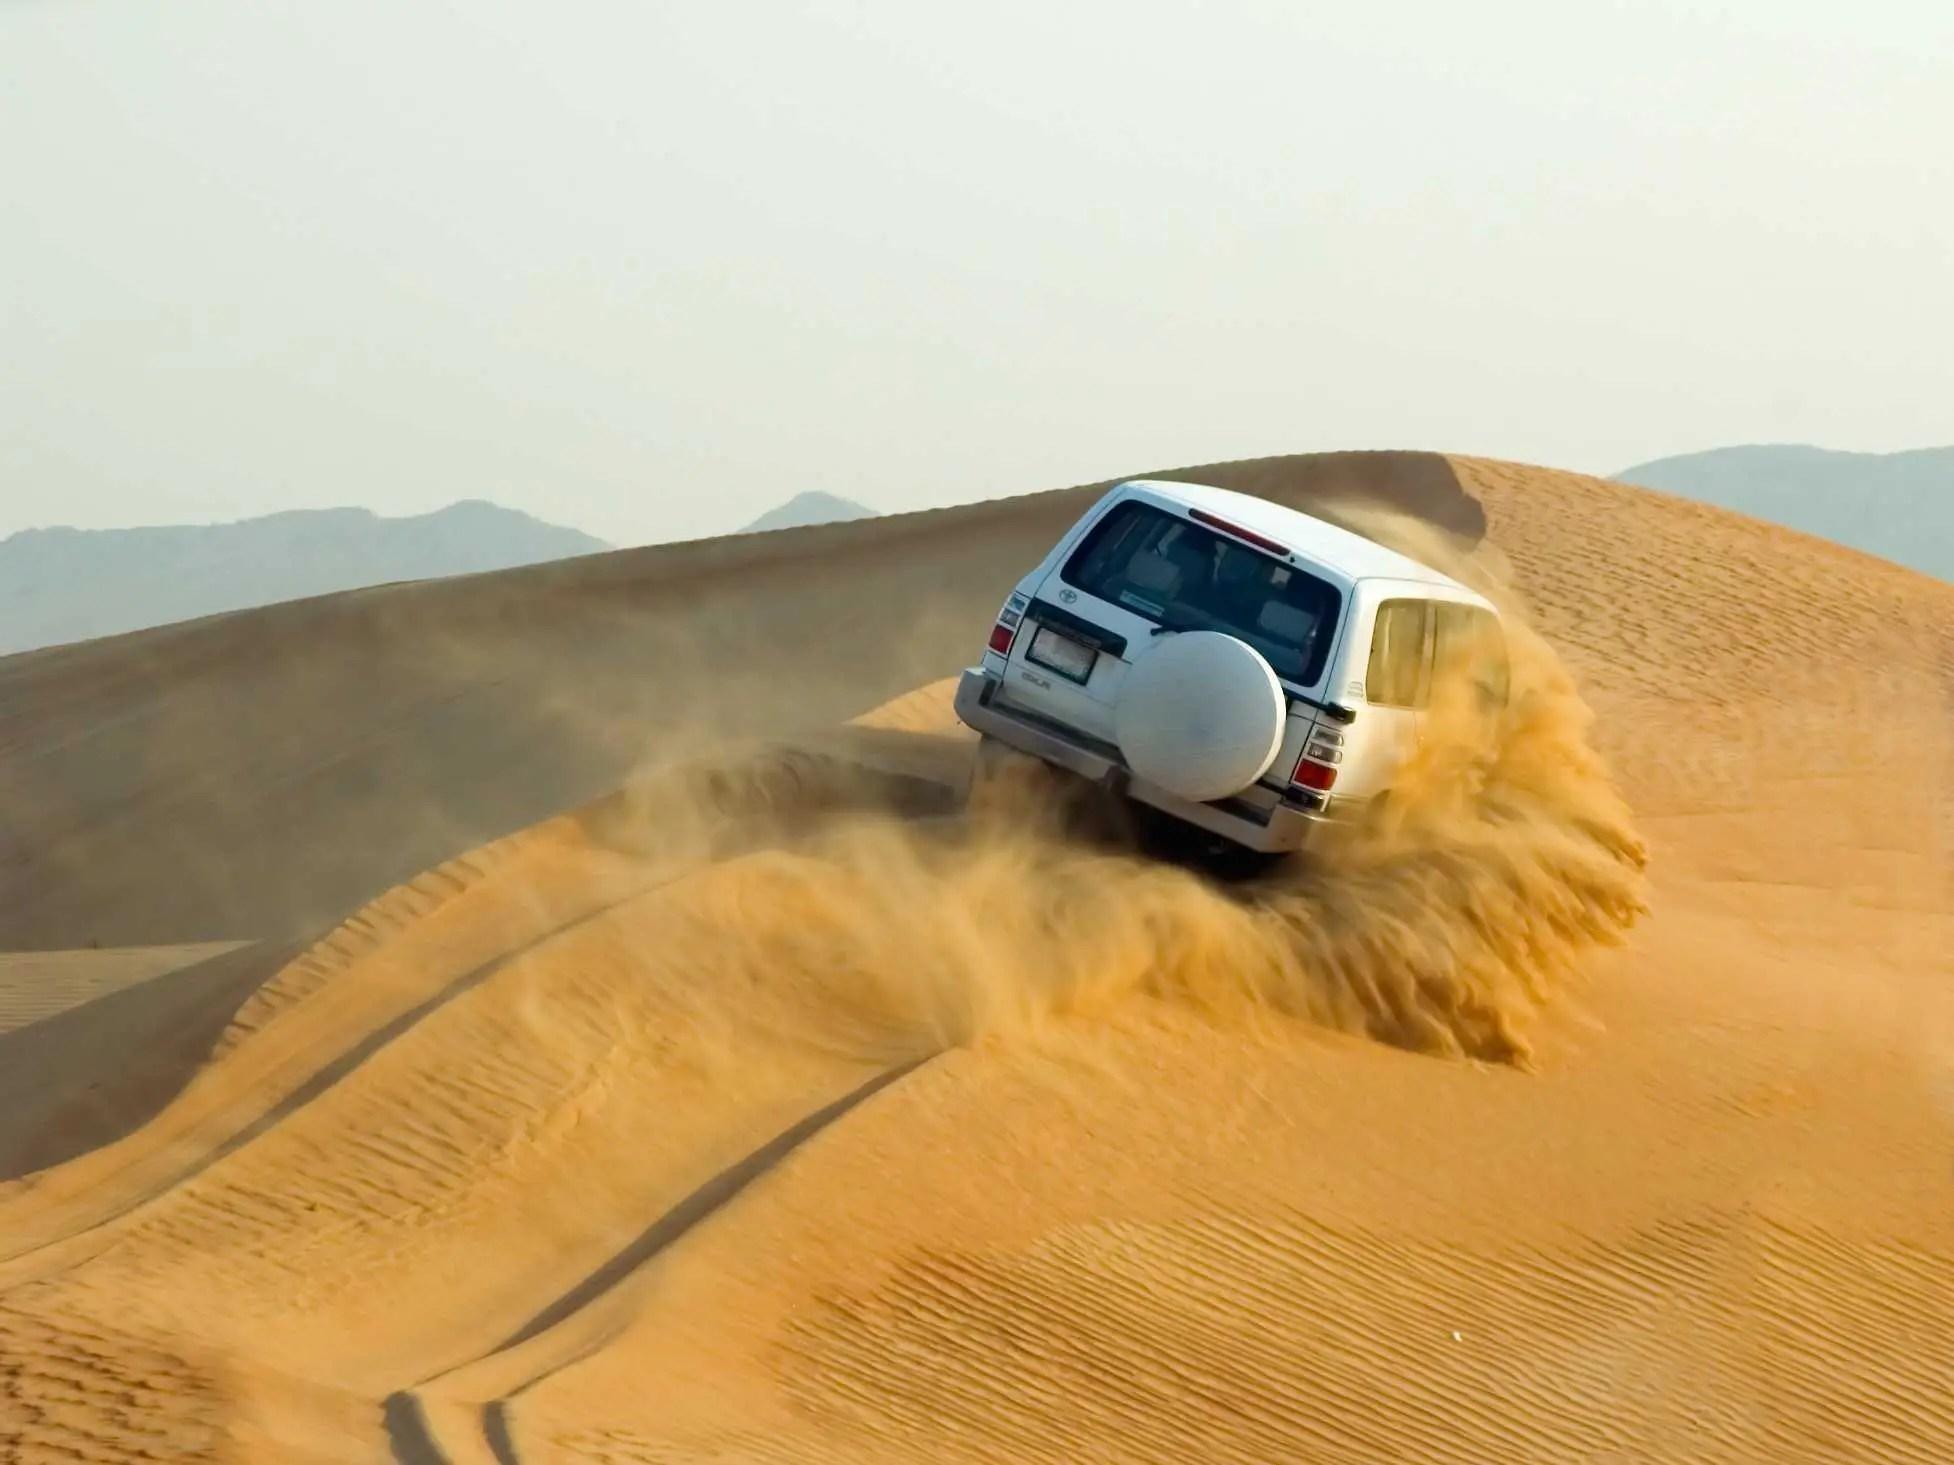 Thunder through the sand dunes outside Abu Dhabi on a desert safari.